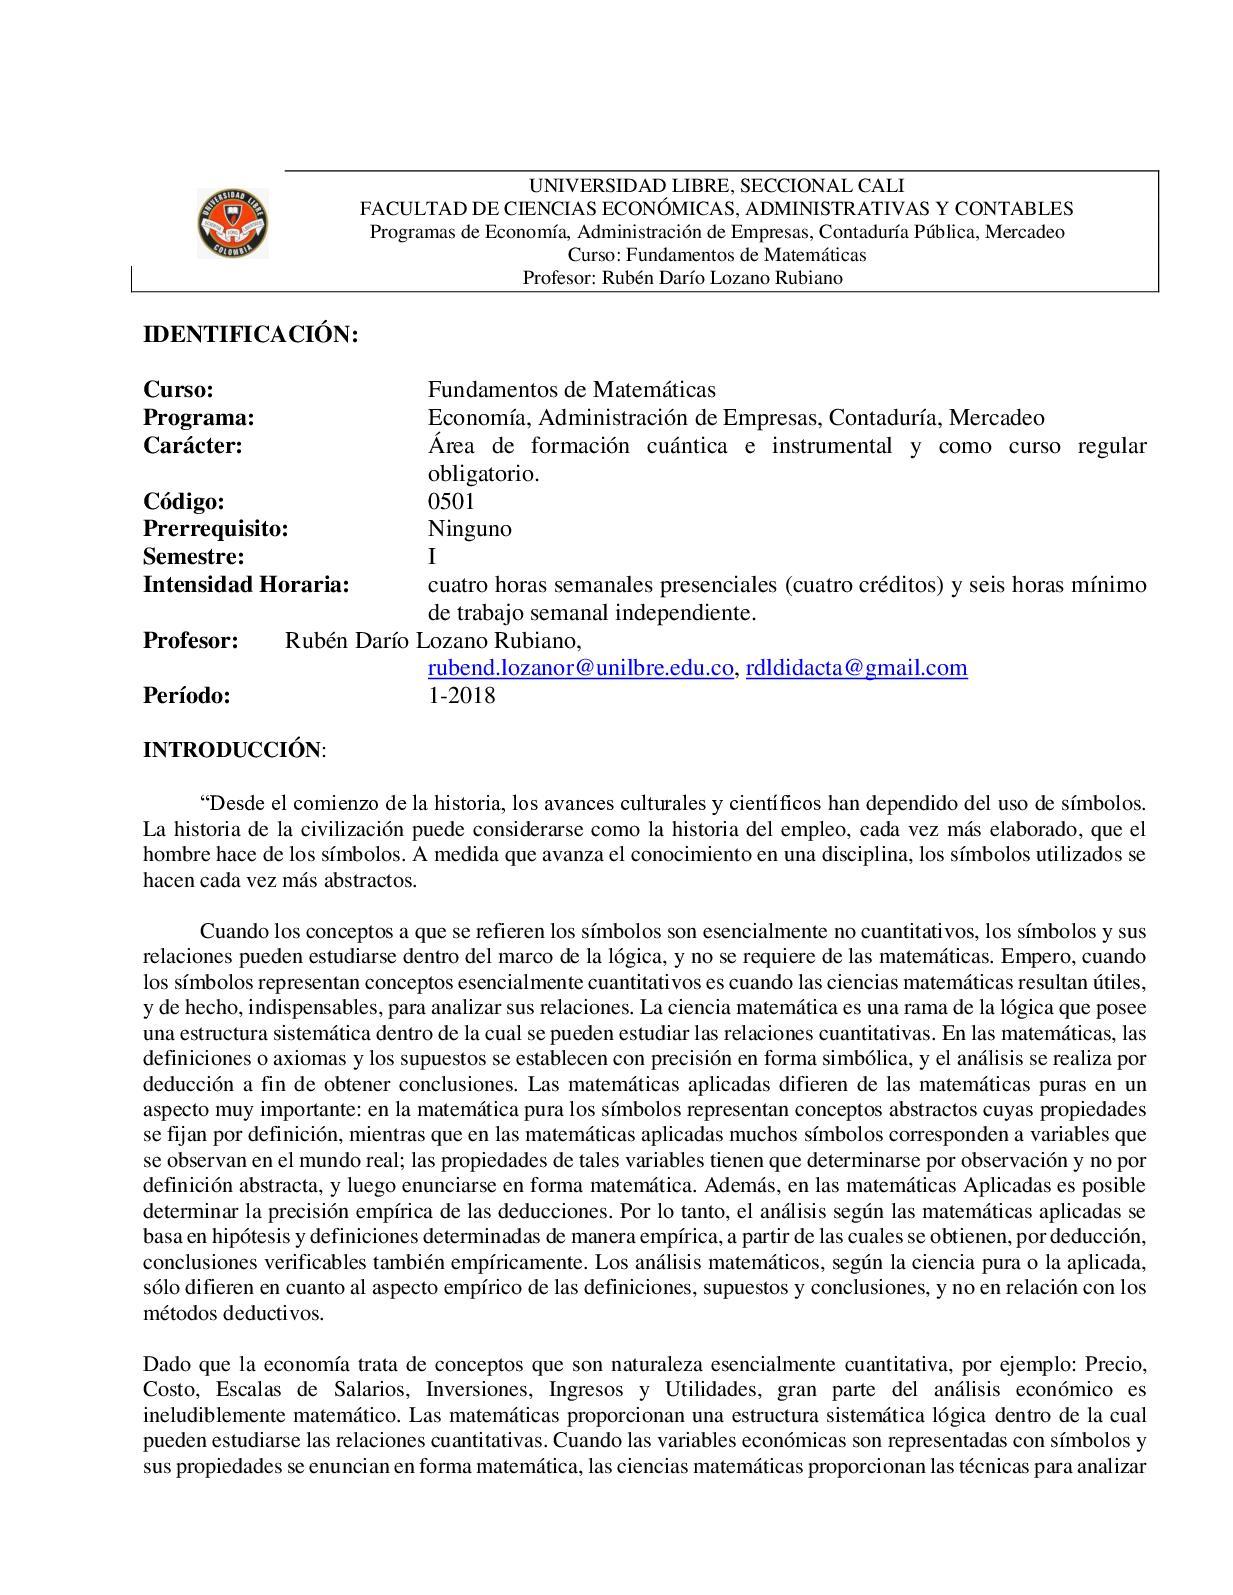 Calaméo Plan Fundamentos De Matemáticas Universidad Libre